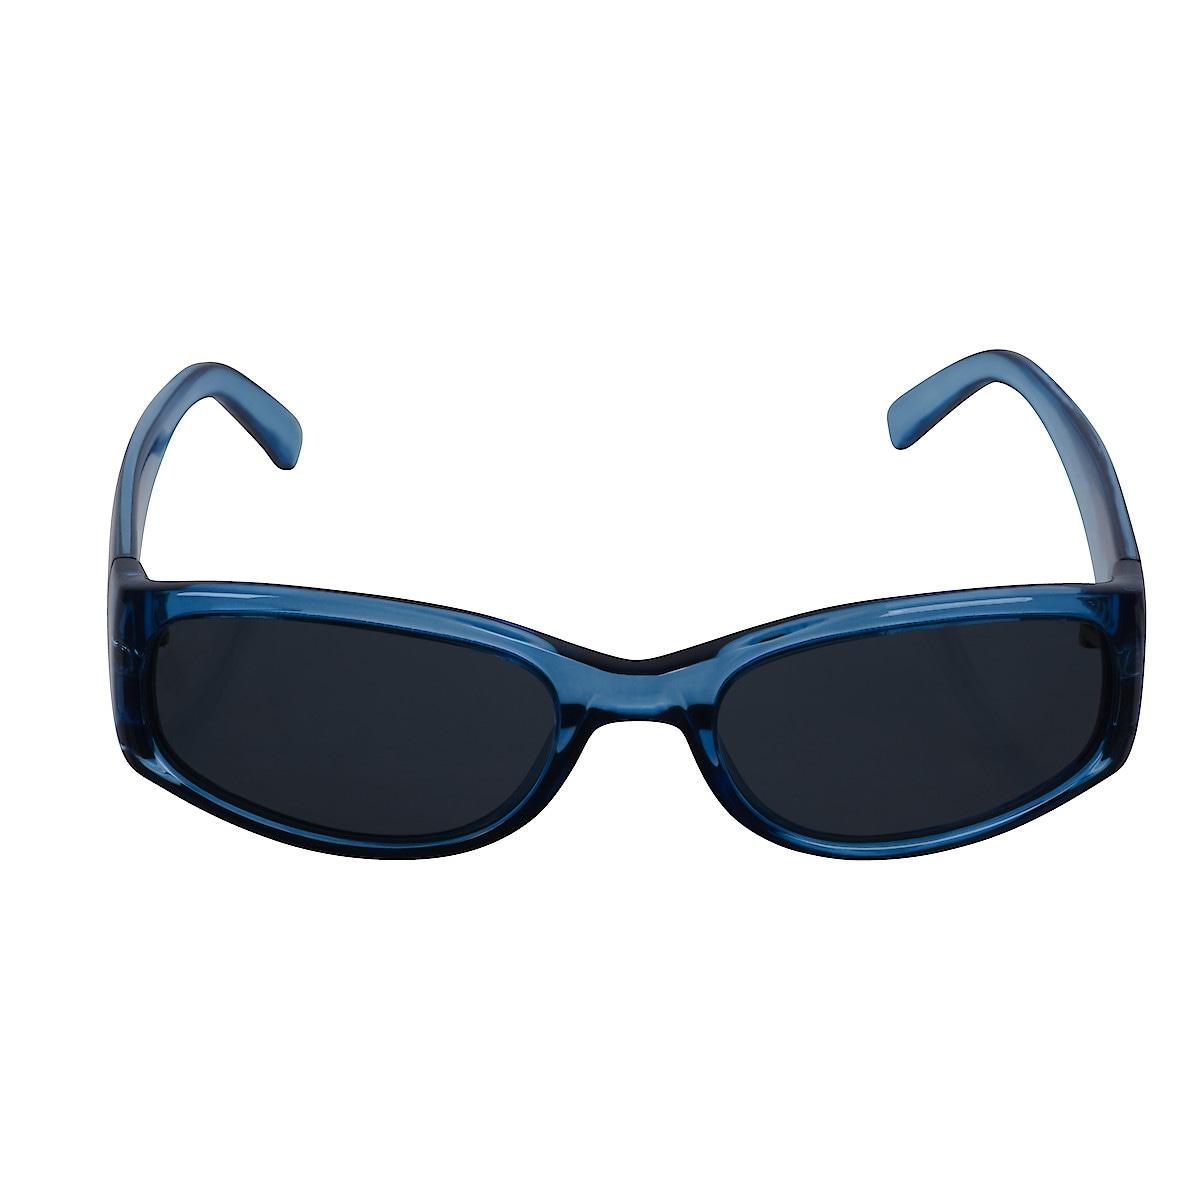 Solbriller small